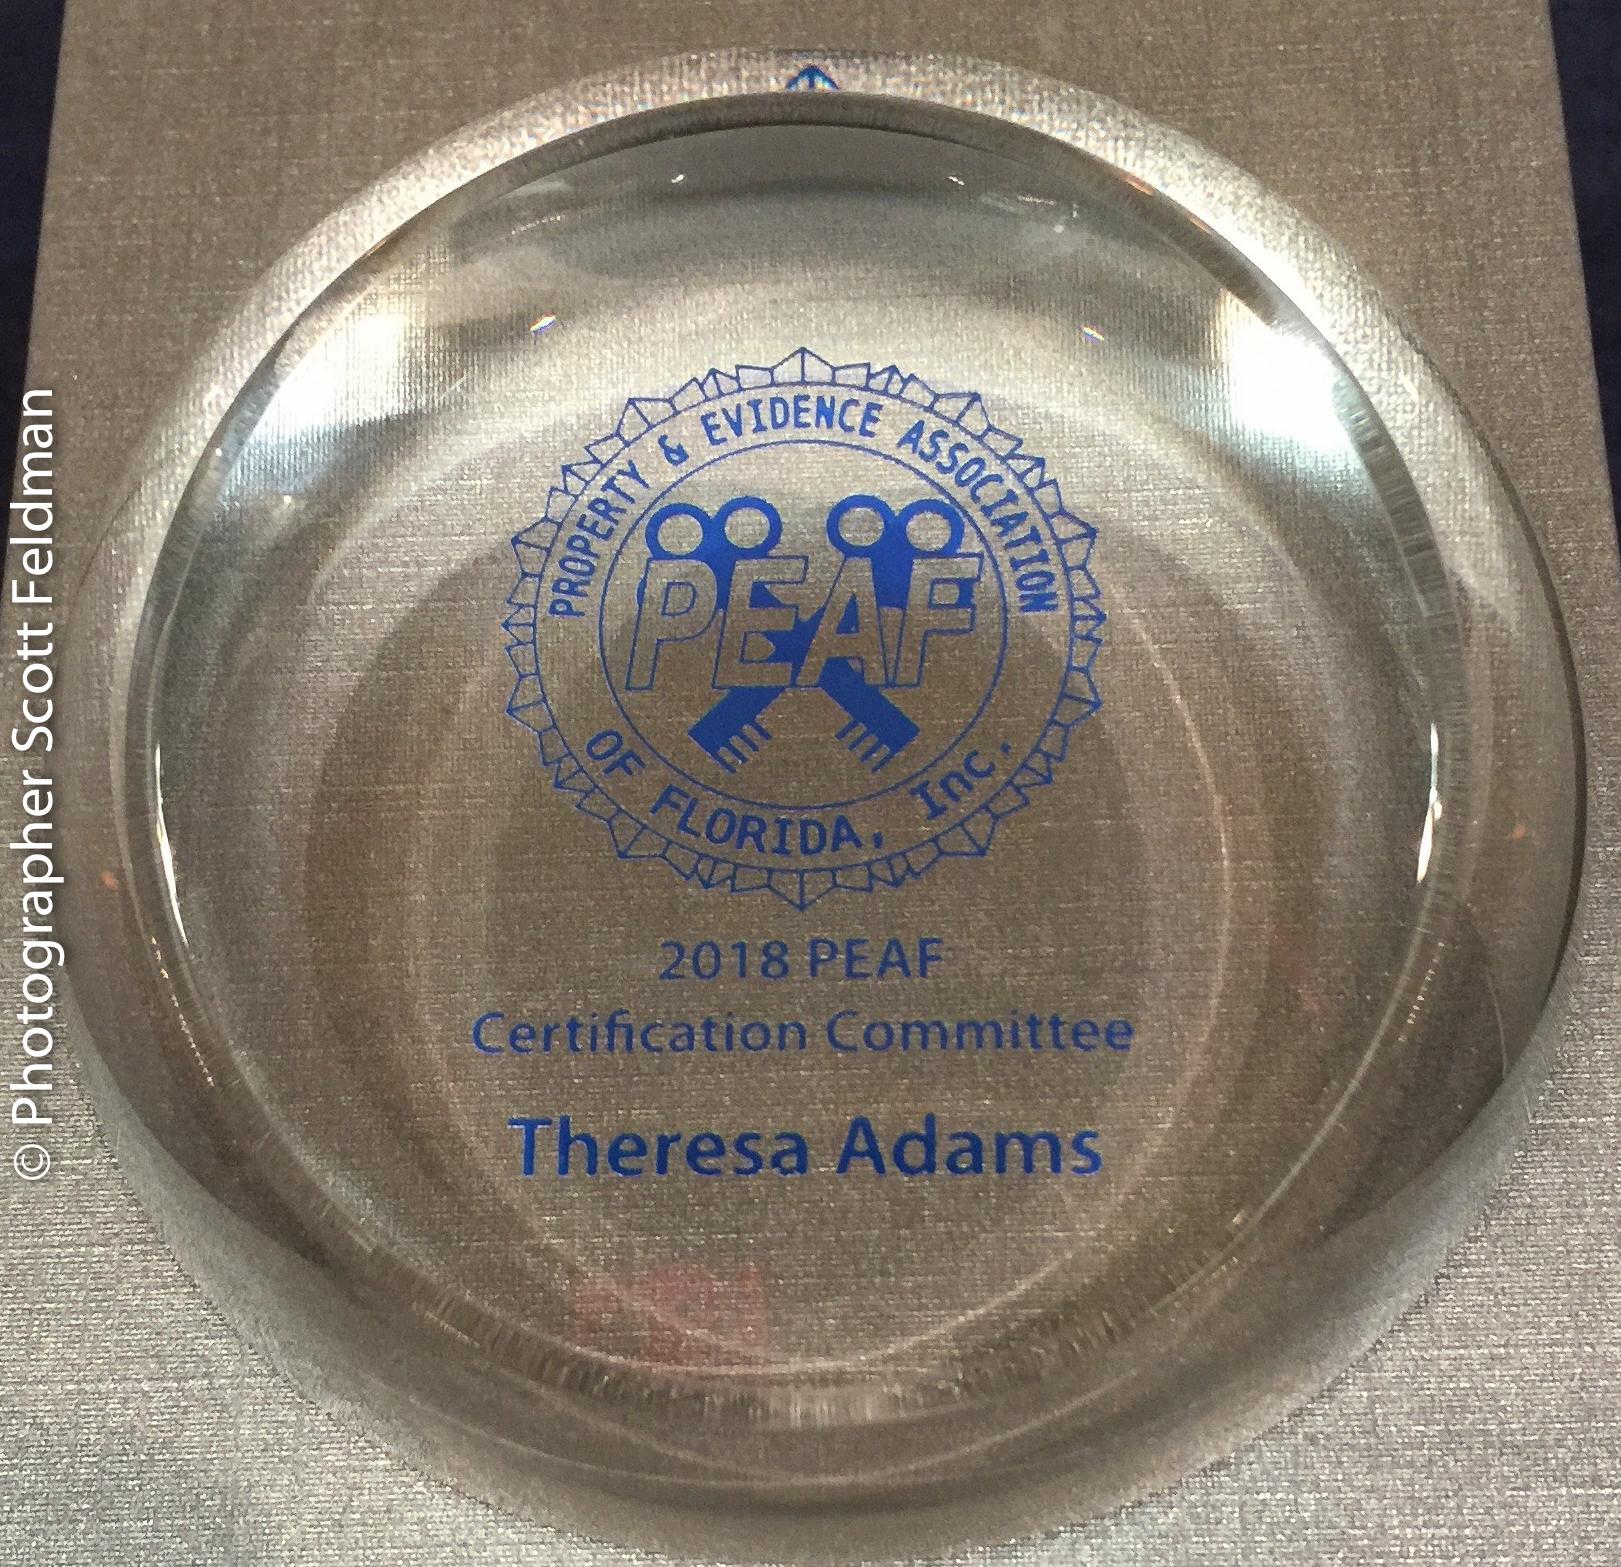 certification-committee-award-theresa-adams